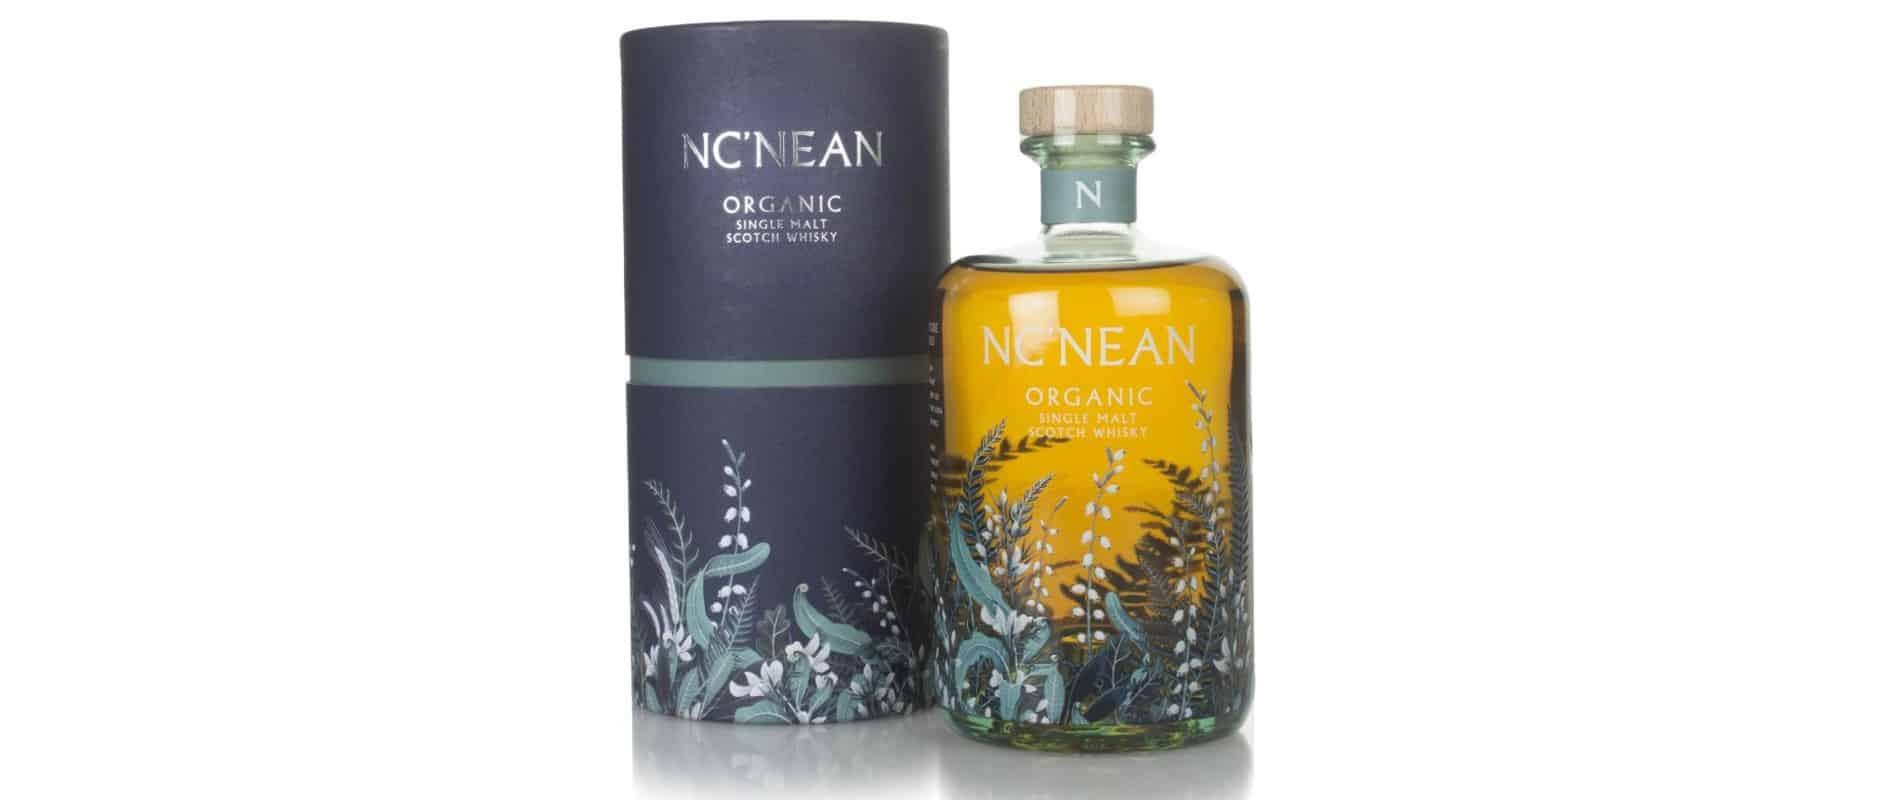 ncnean organic single malt batch 2